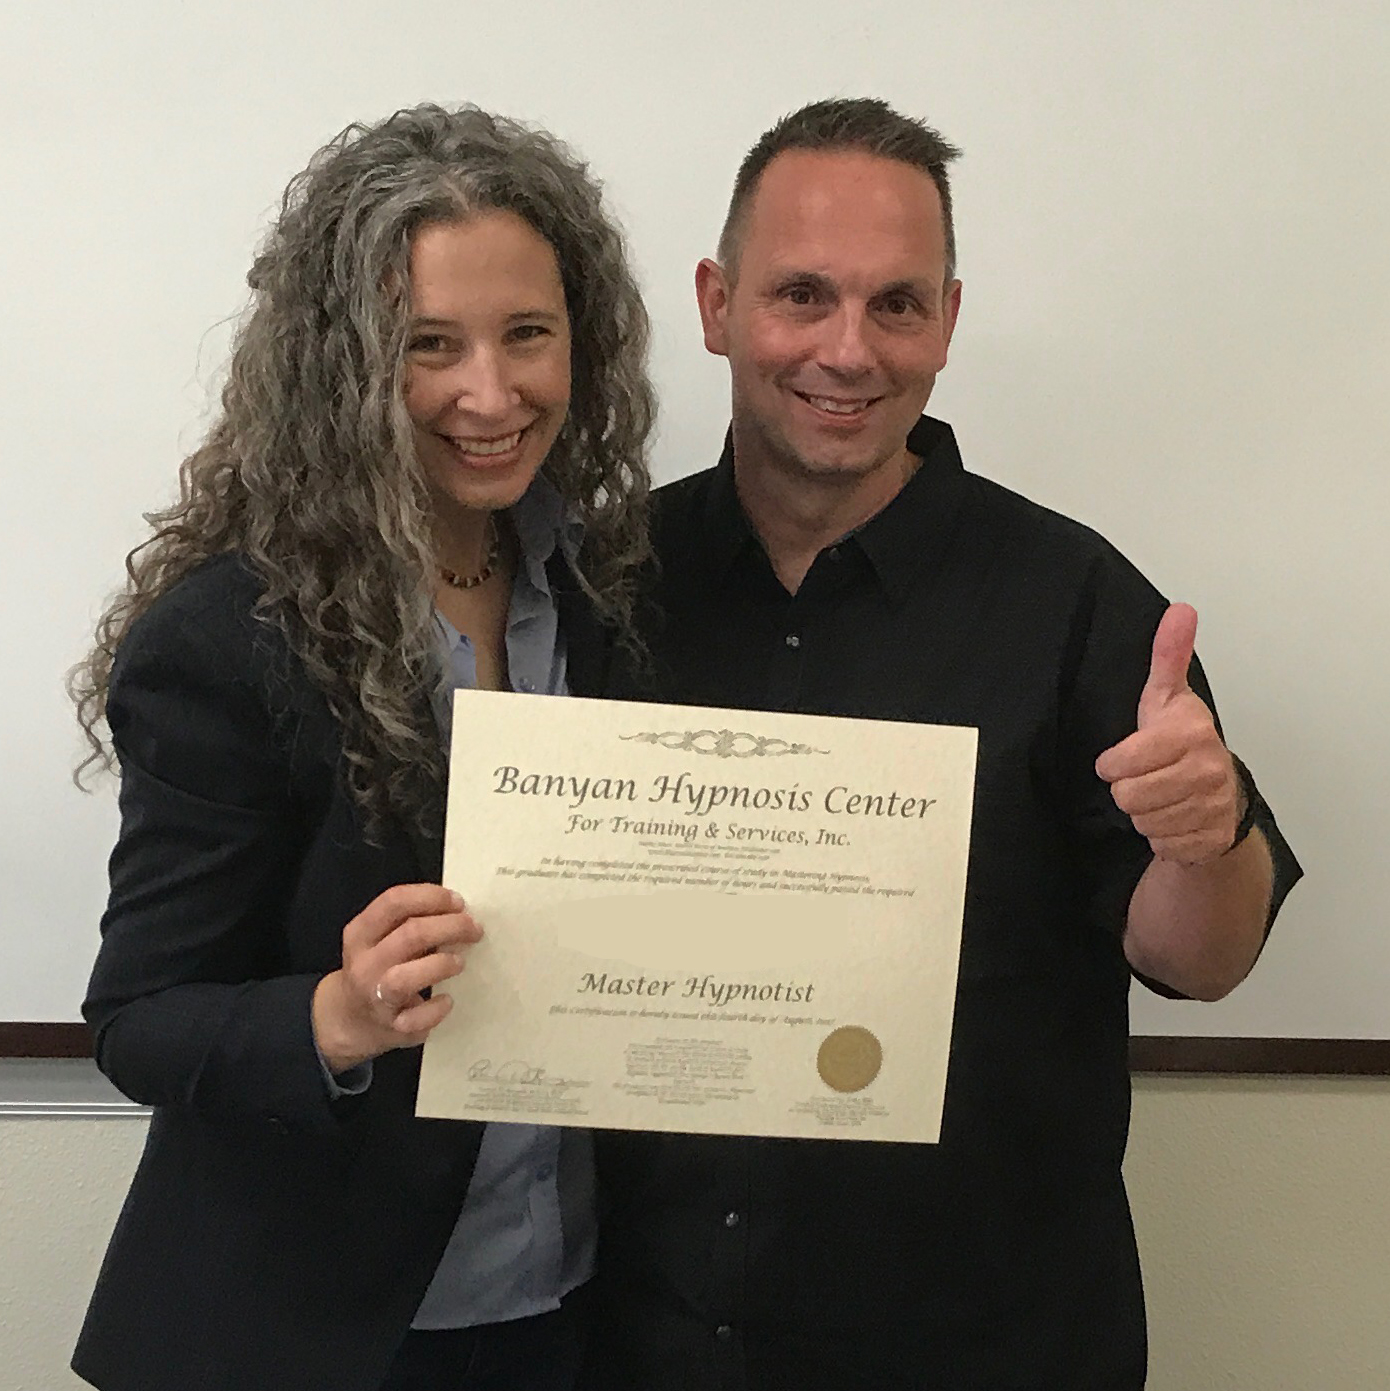 Adrian Hypnosis Training Testimonial